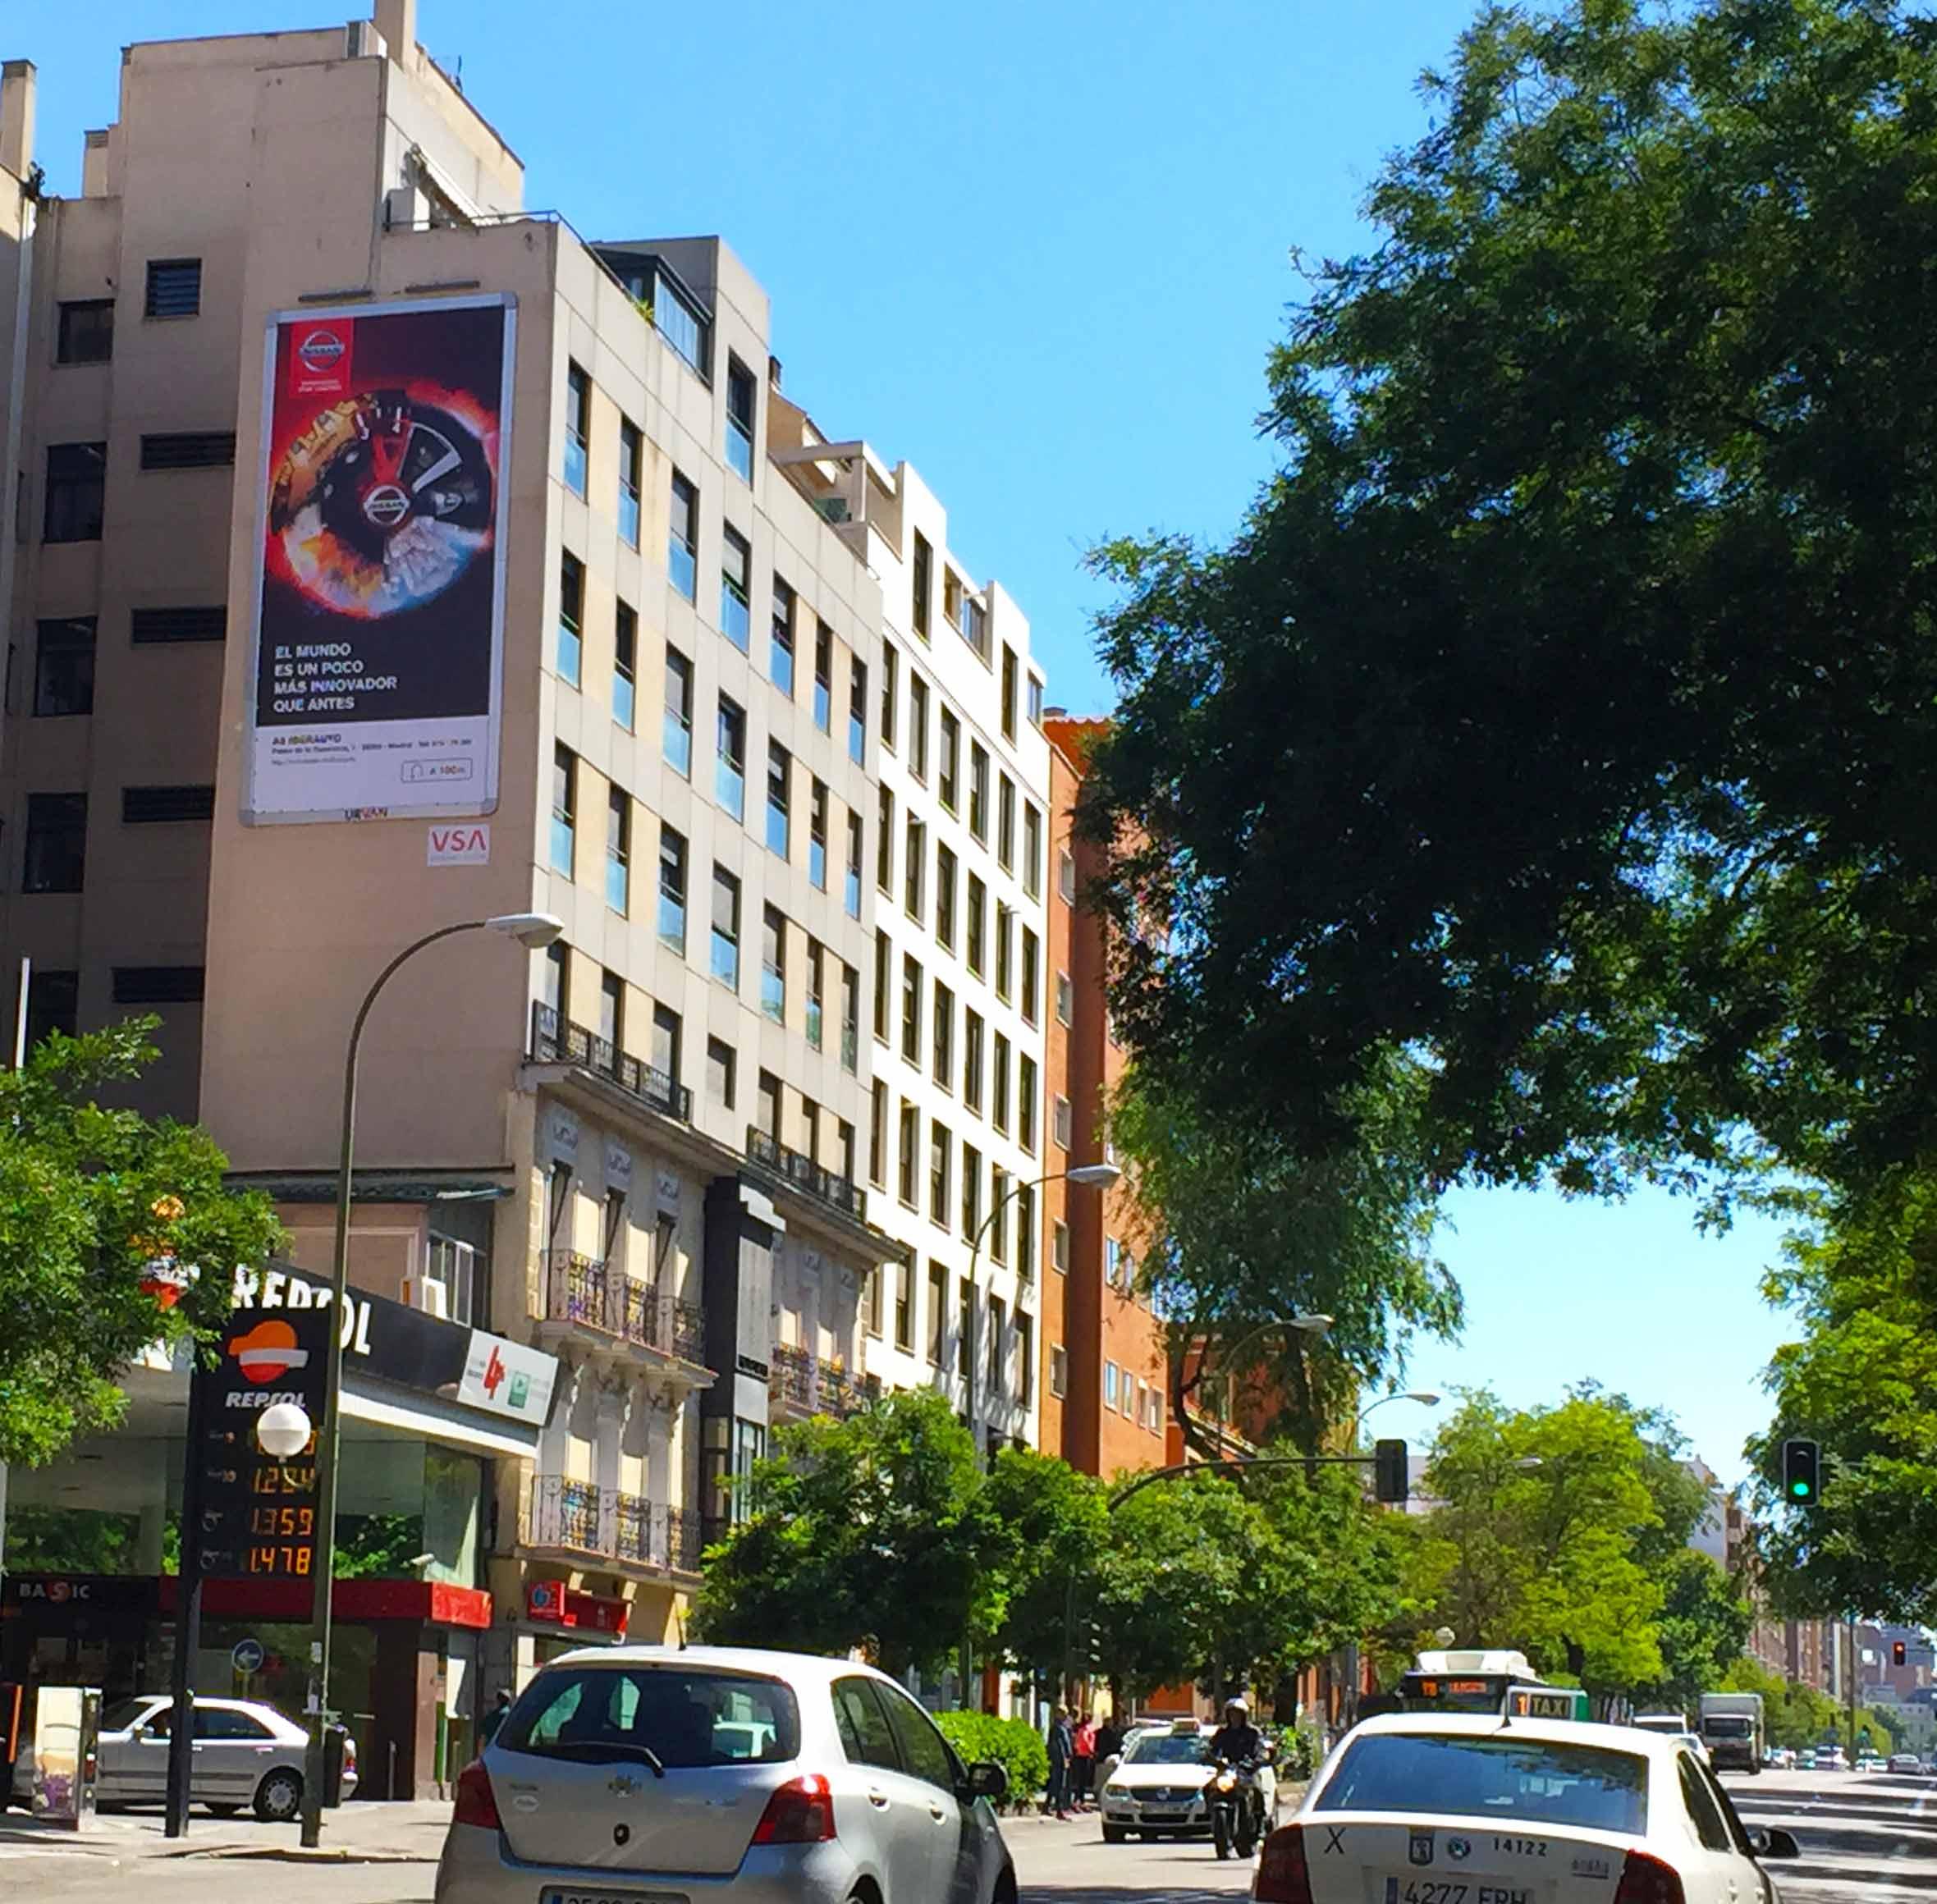 pym-medianera-publicidad-exterior-nissan-iberauto-madrid-vsa-comunicacion